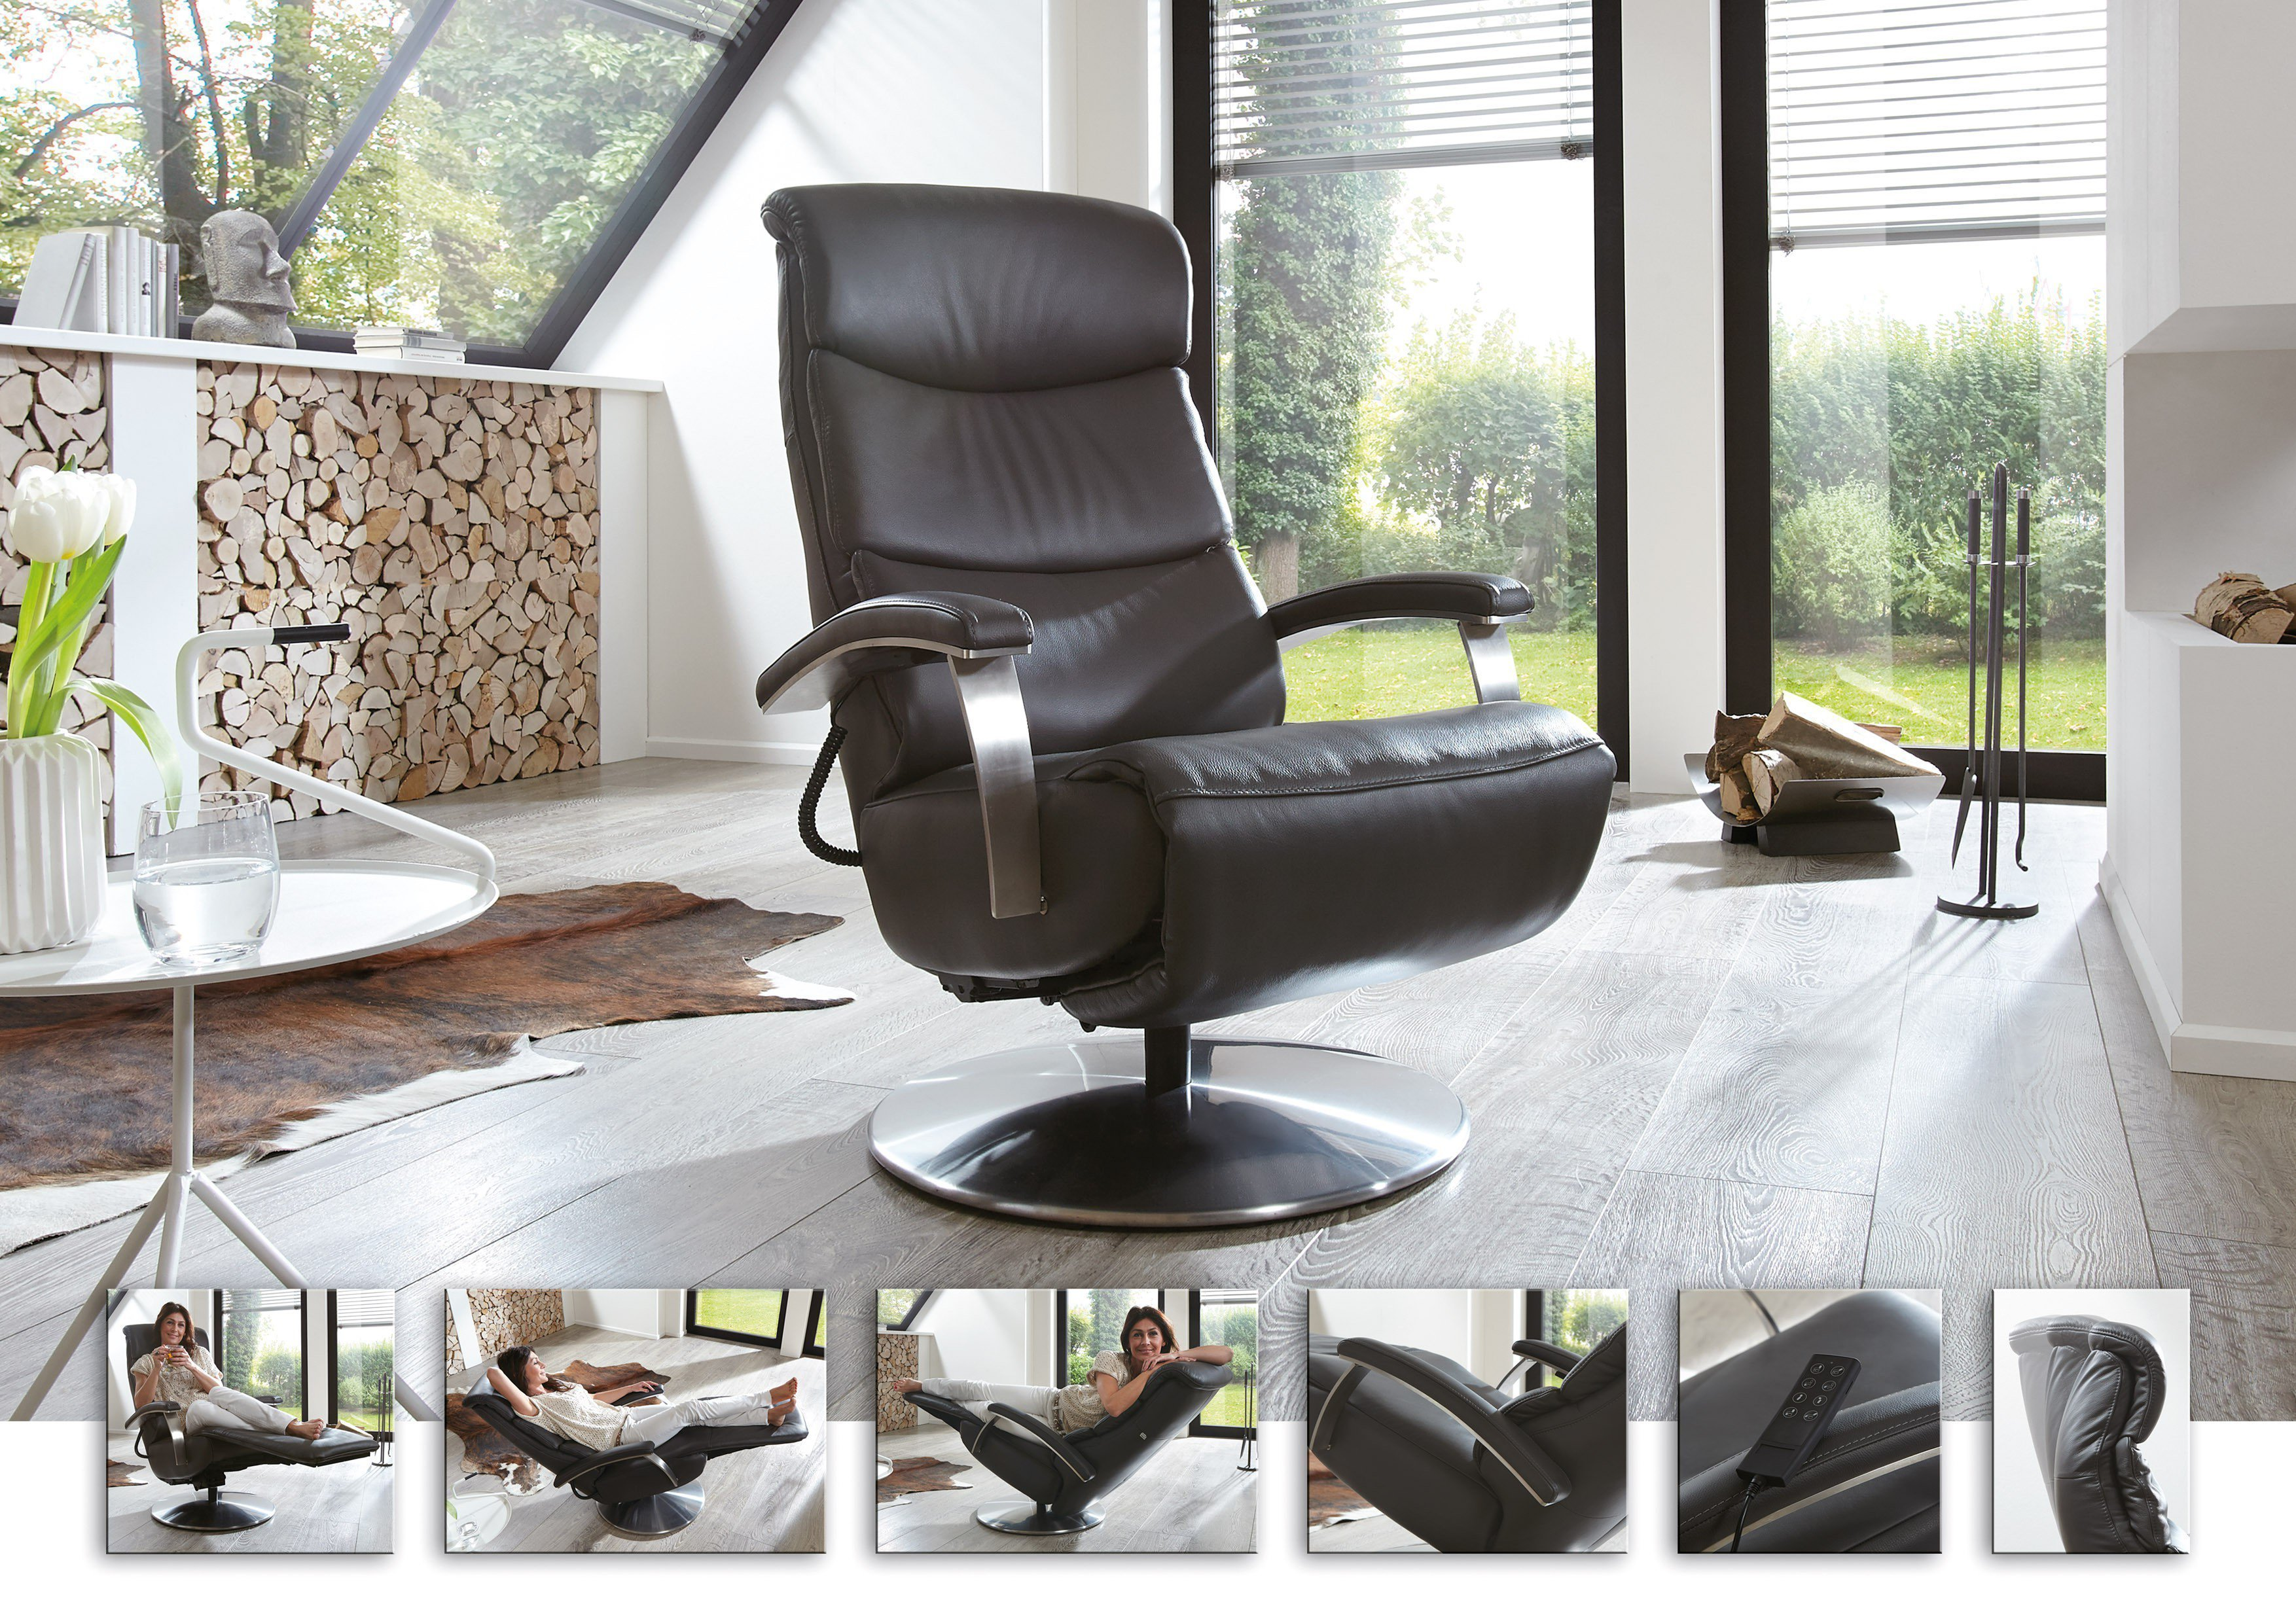 Hukla Cosyrelax Cr 06 Relaxsessel In Grau Möbel Letz Ihr Online